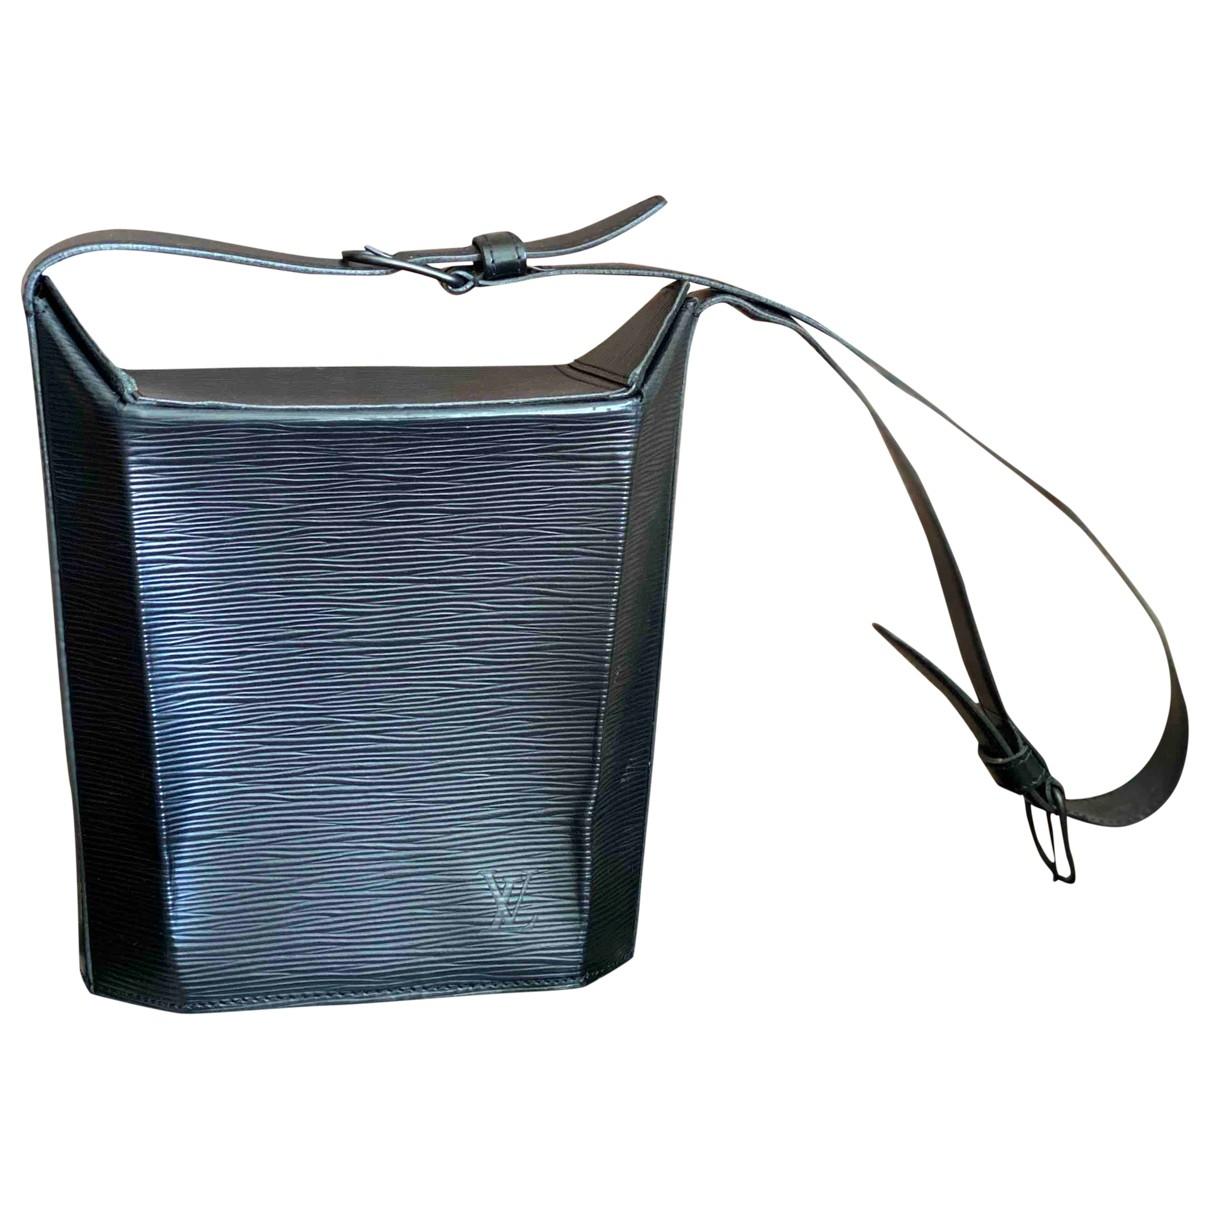 Bolso  Bento Box Vintage  de Cuero Louis Vuitton